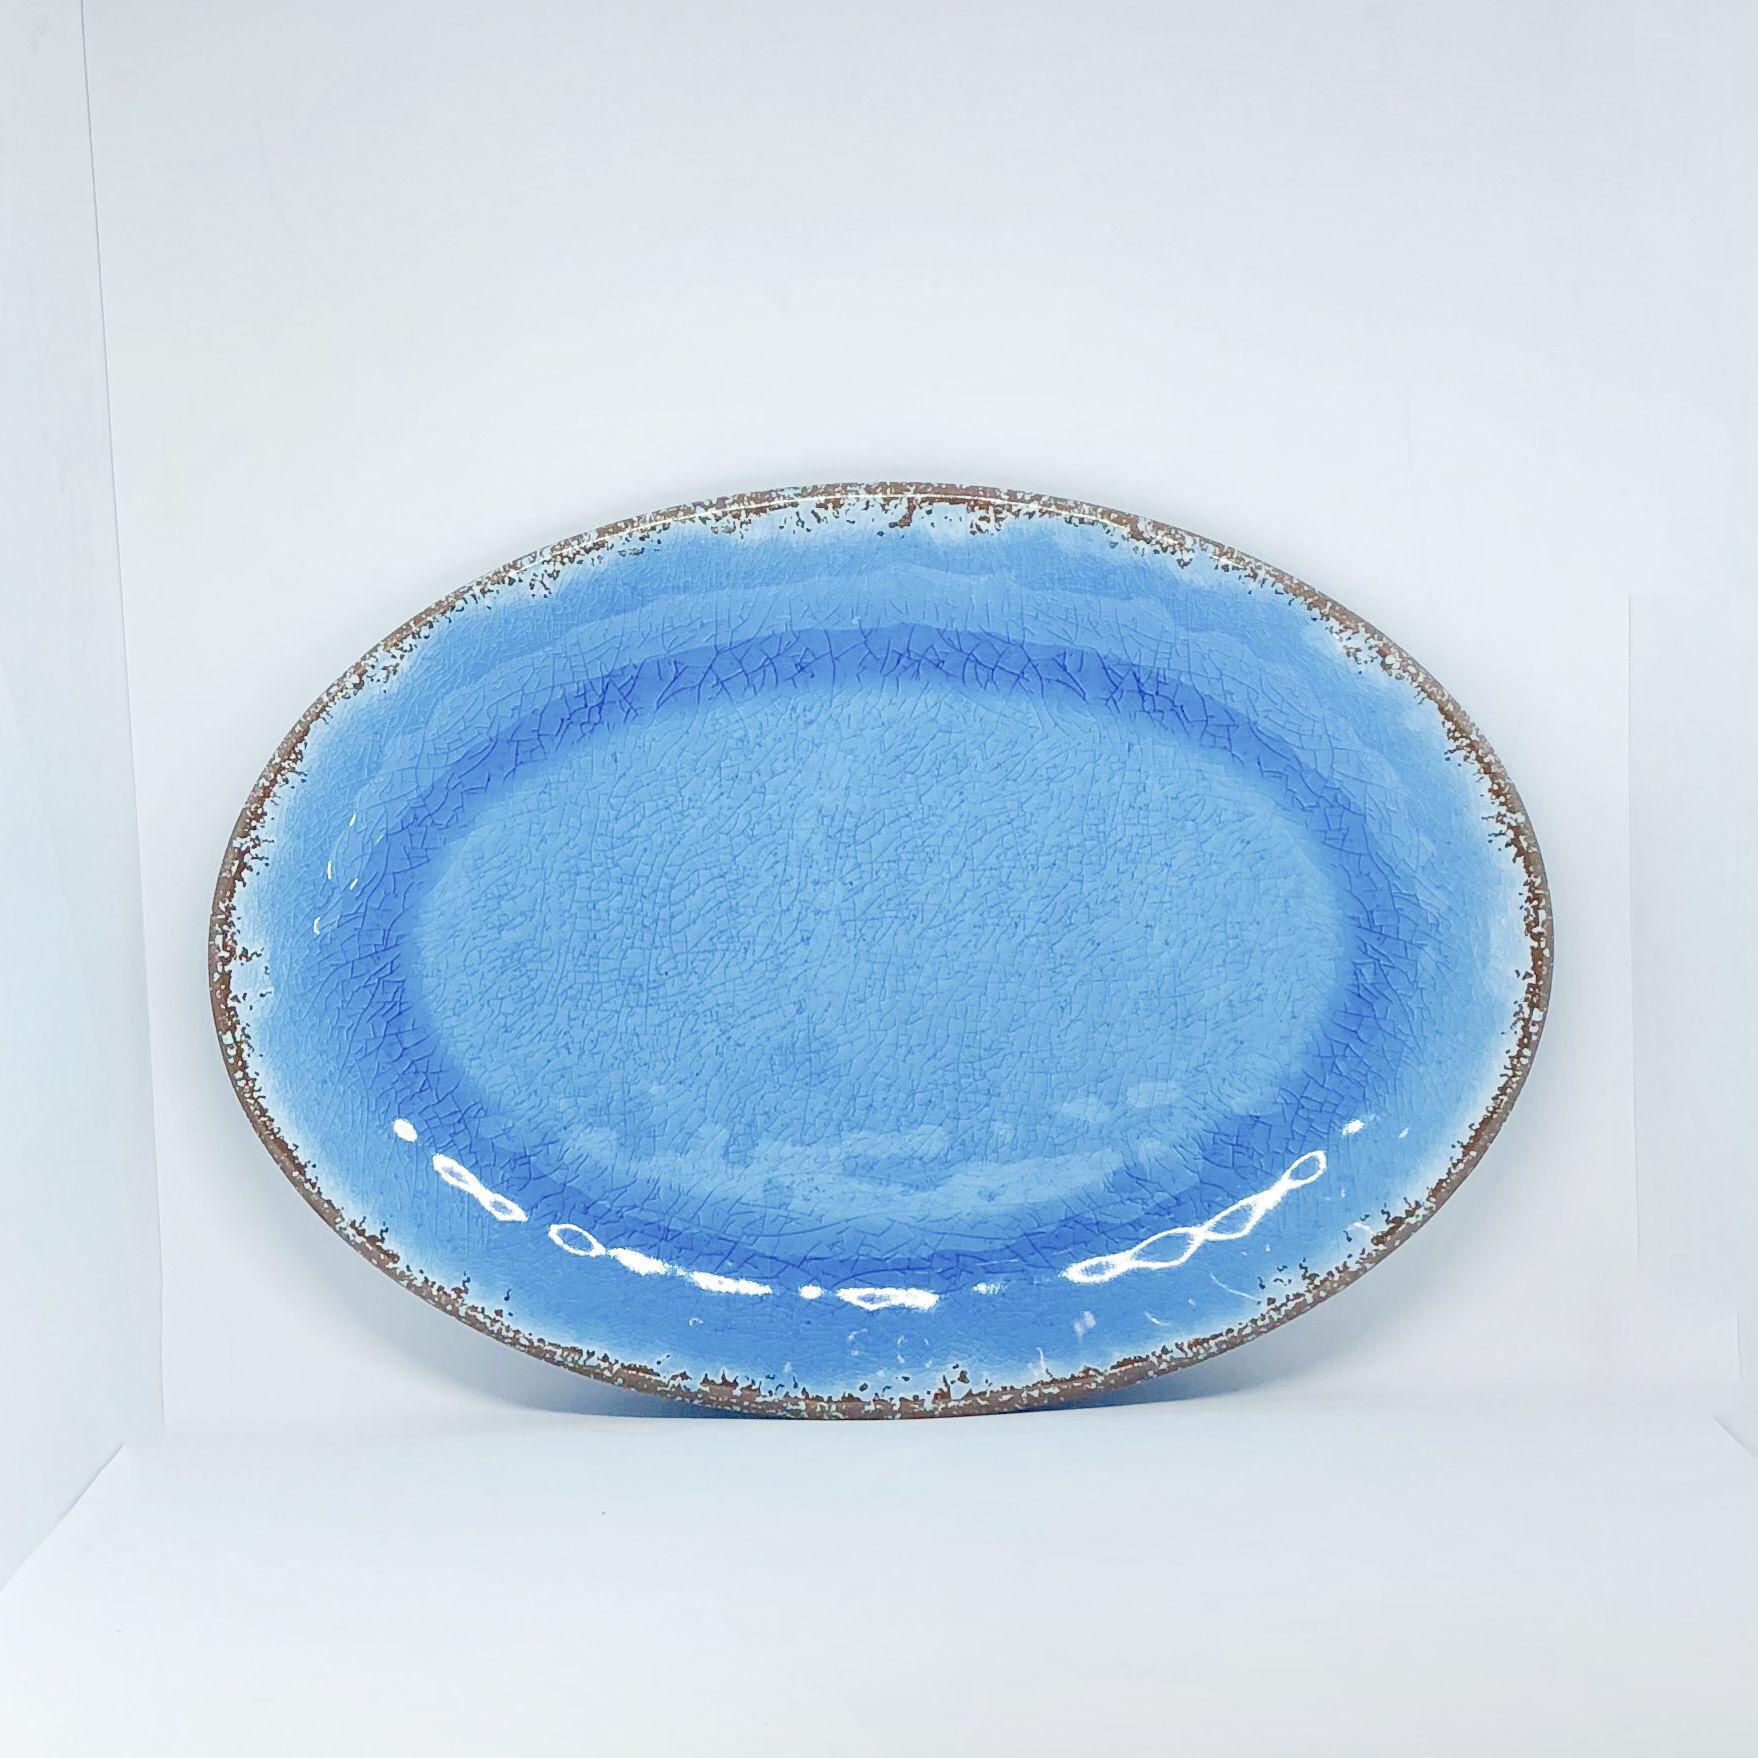 Antique Fuente azul